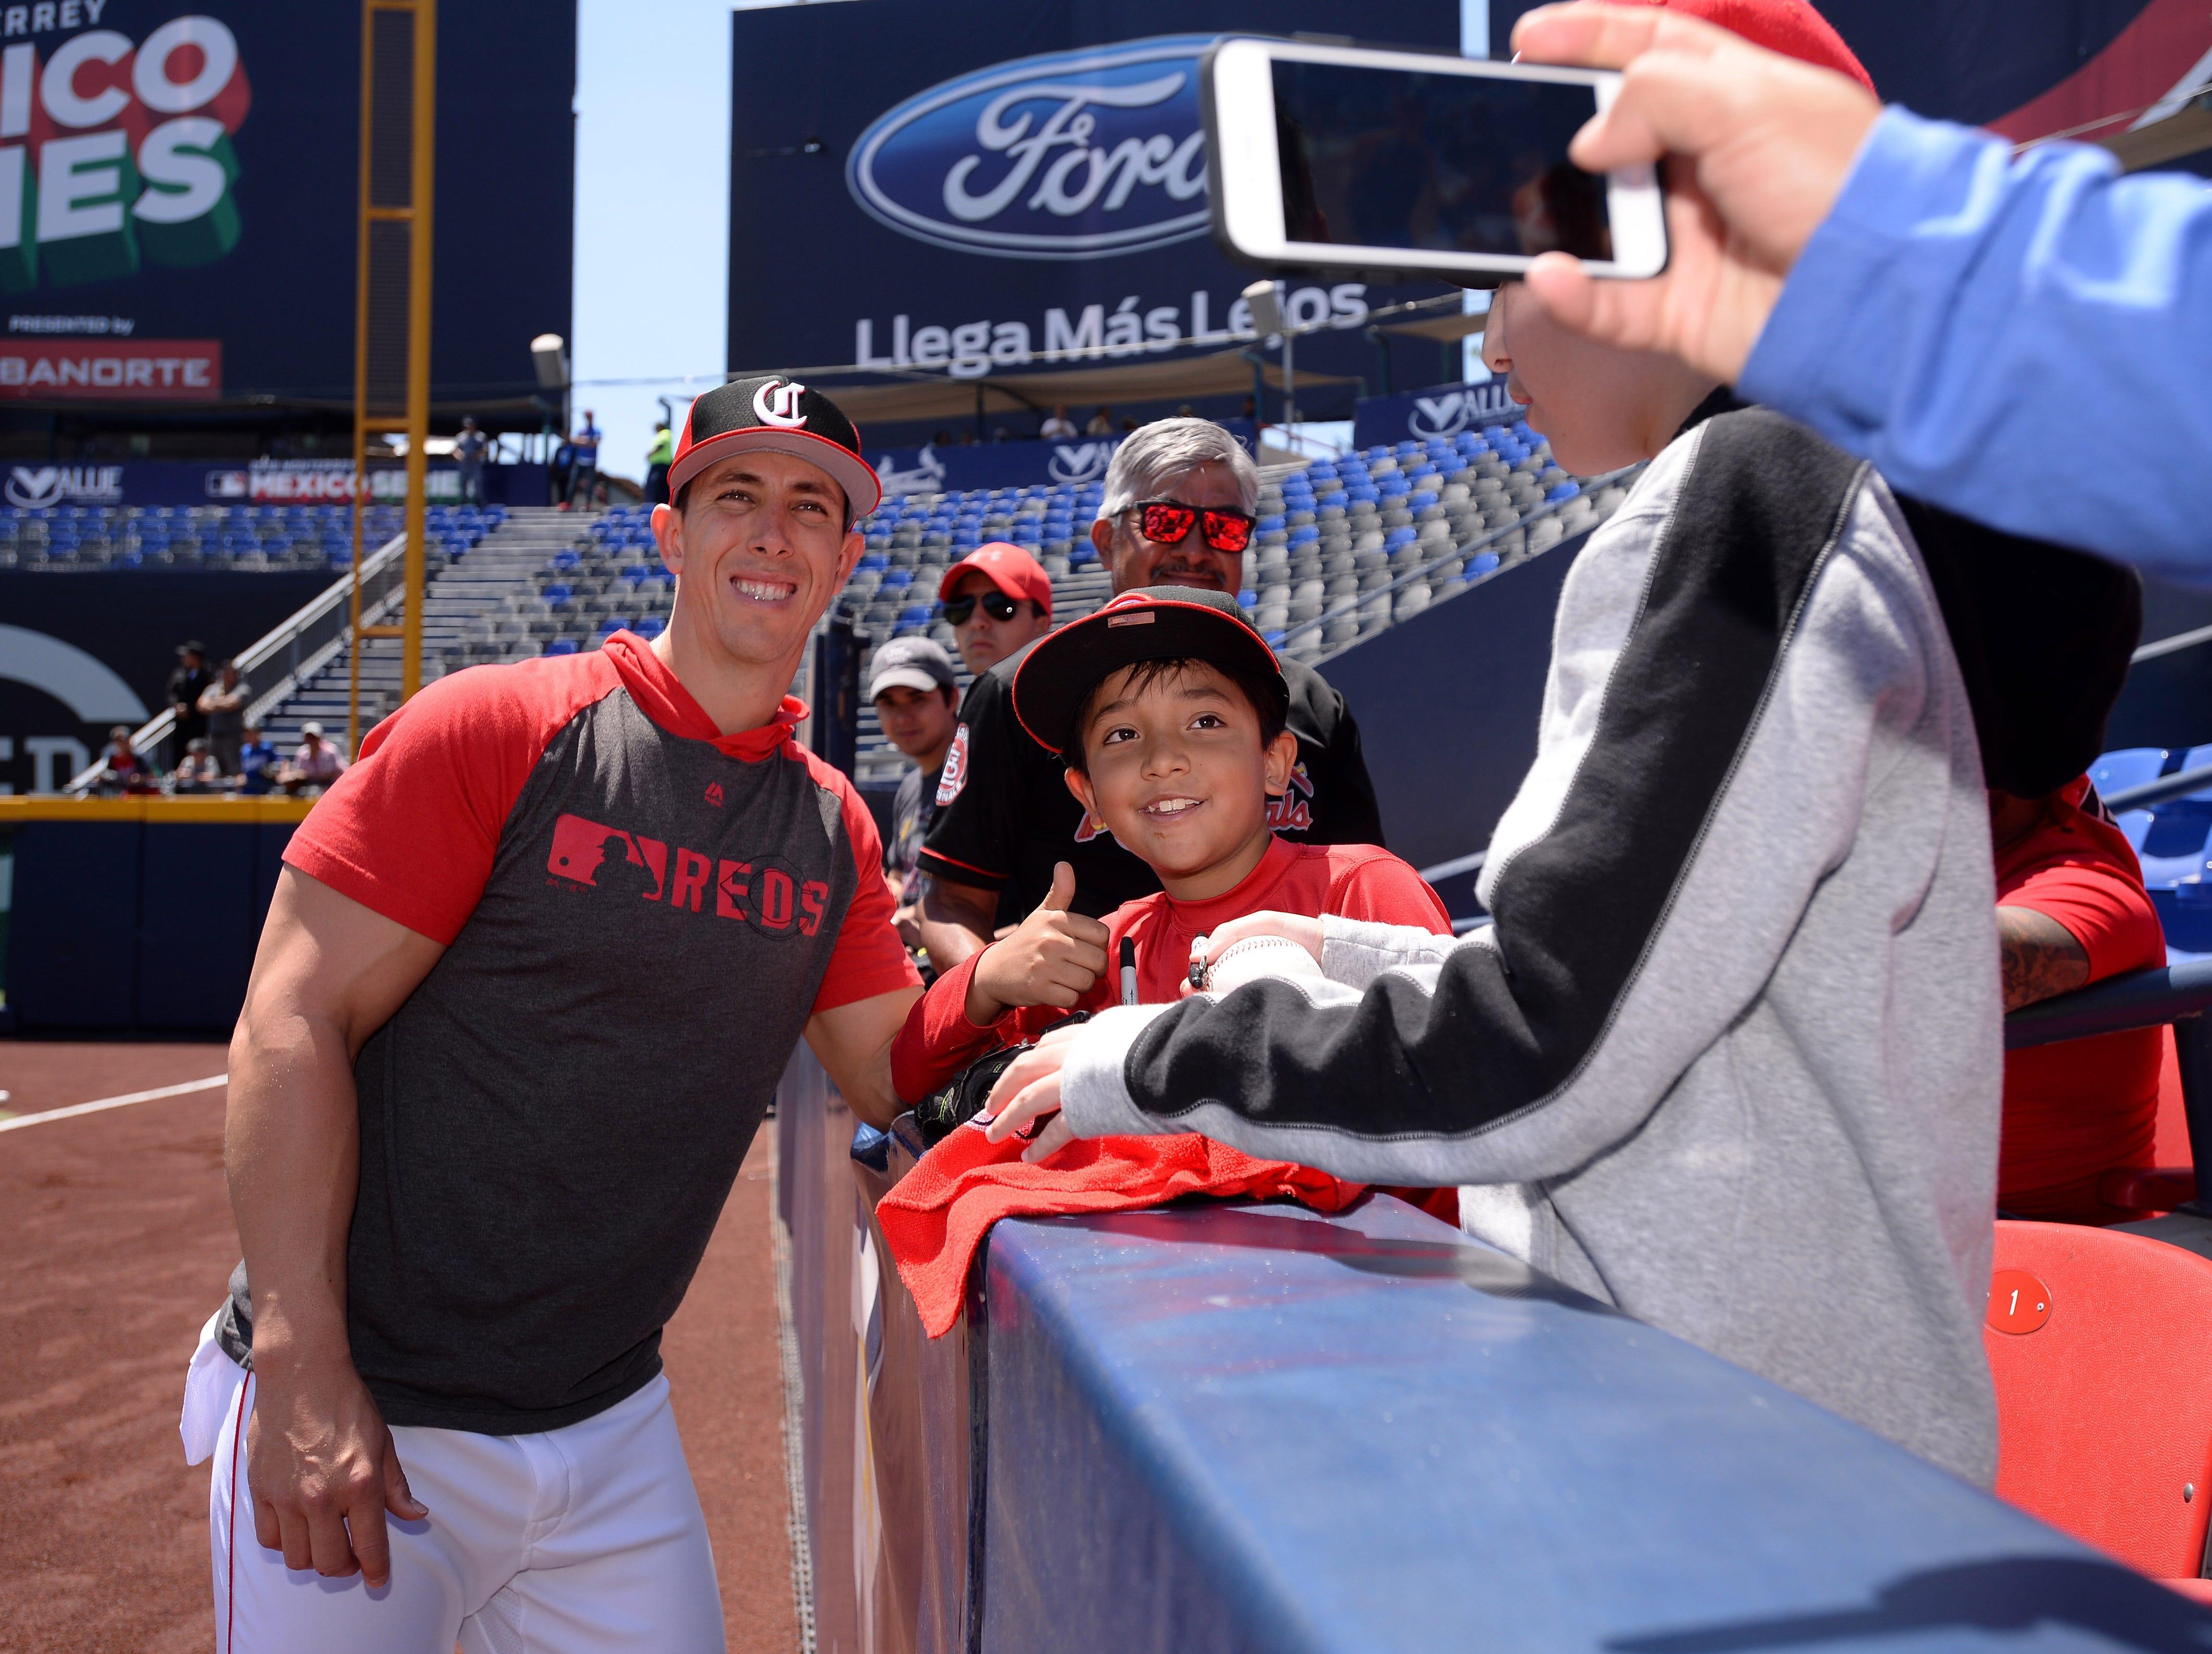 Cincinnati Reds relief pitcher Michael Lorenzen (21) takes a photograph with a fan before the game against the St. Louis Cardinals at Estadio de Beisbol Monterrey.